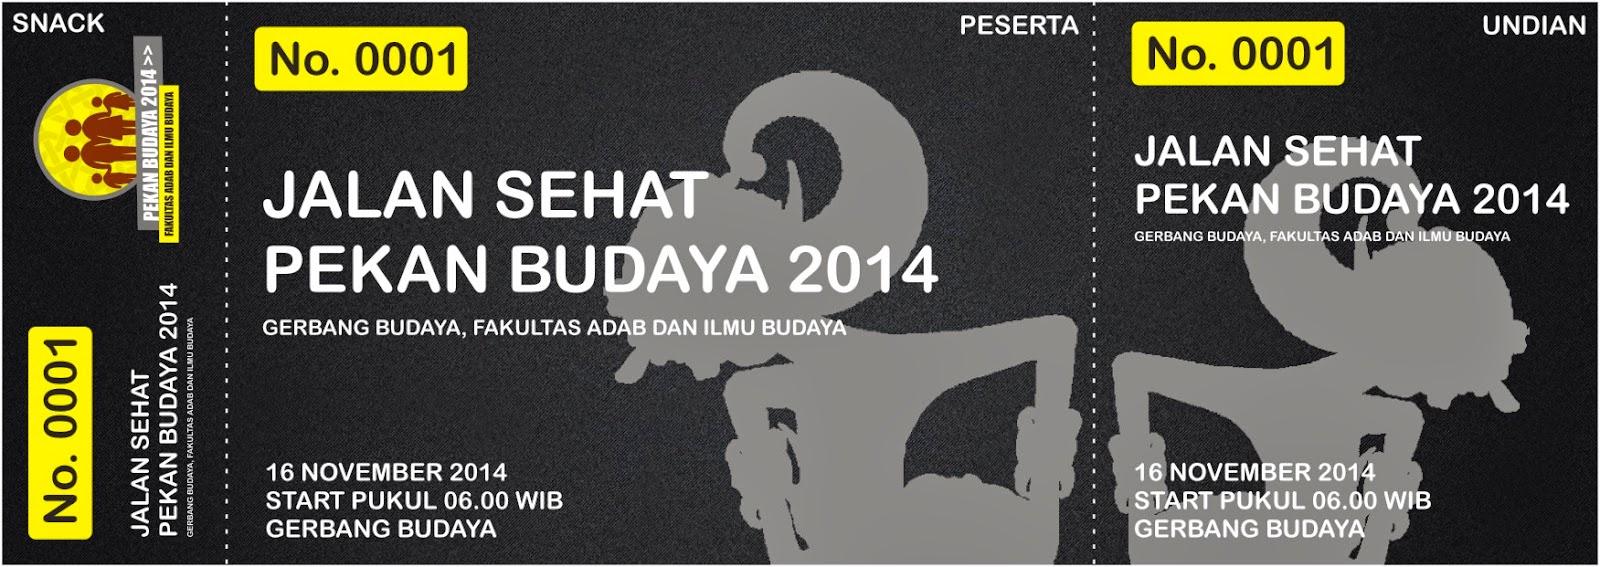 portofolio   event pekan budaya 2014